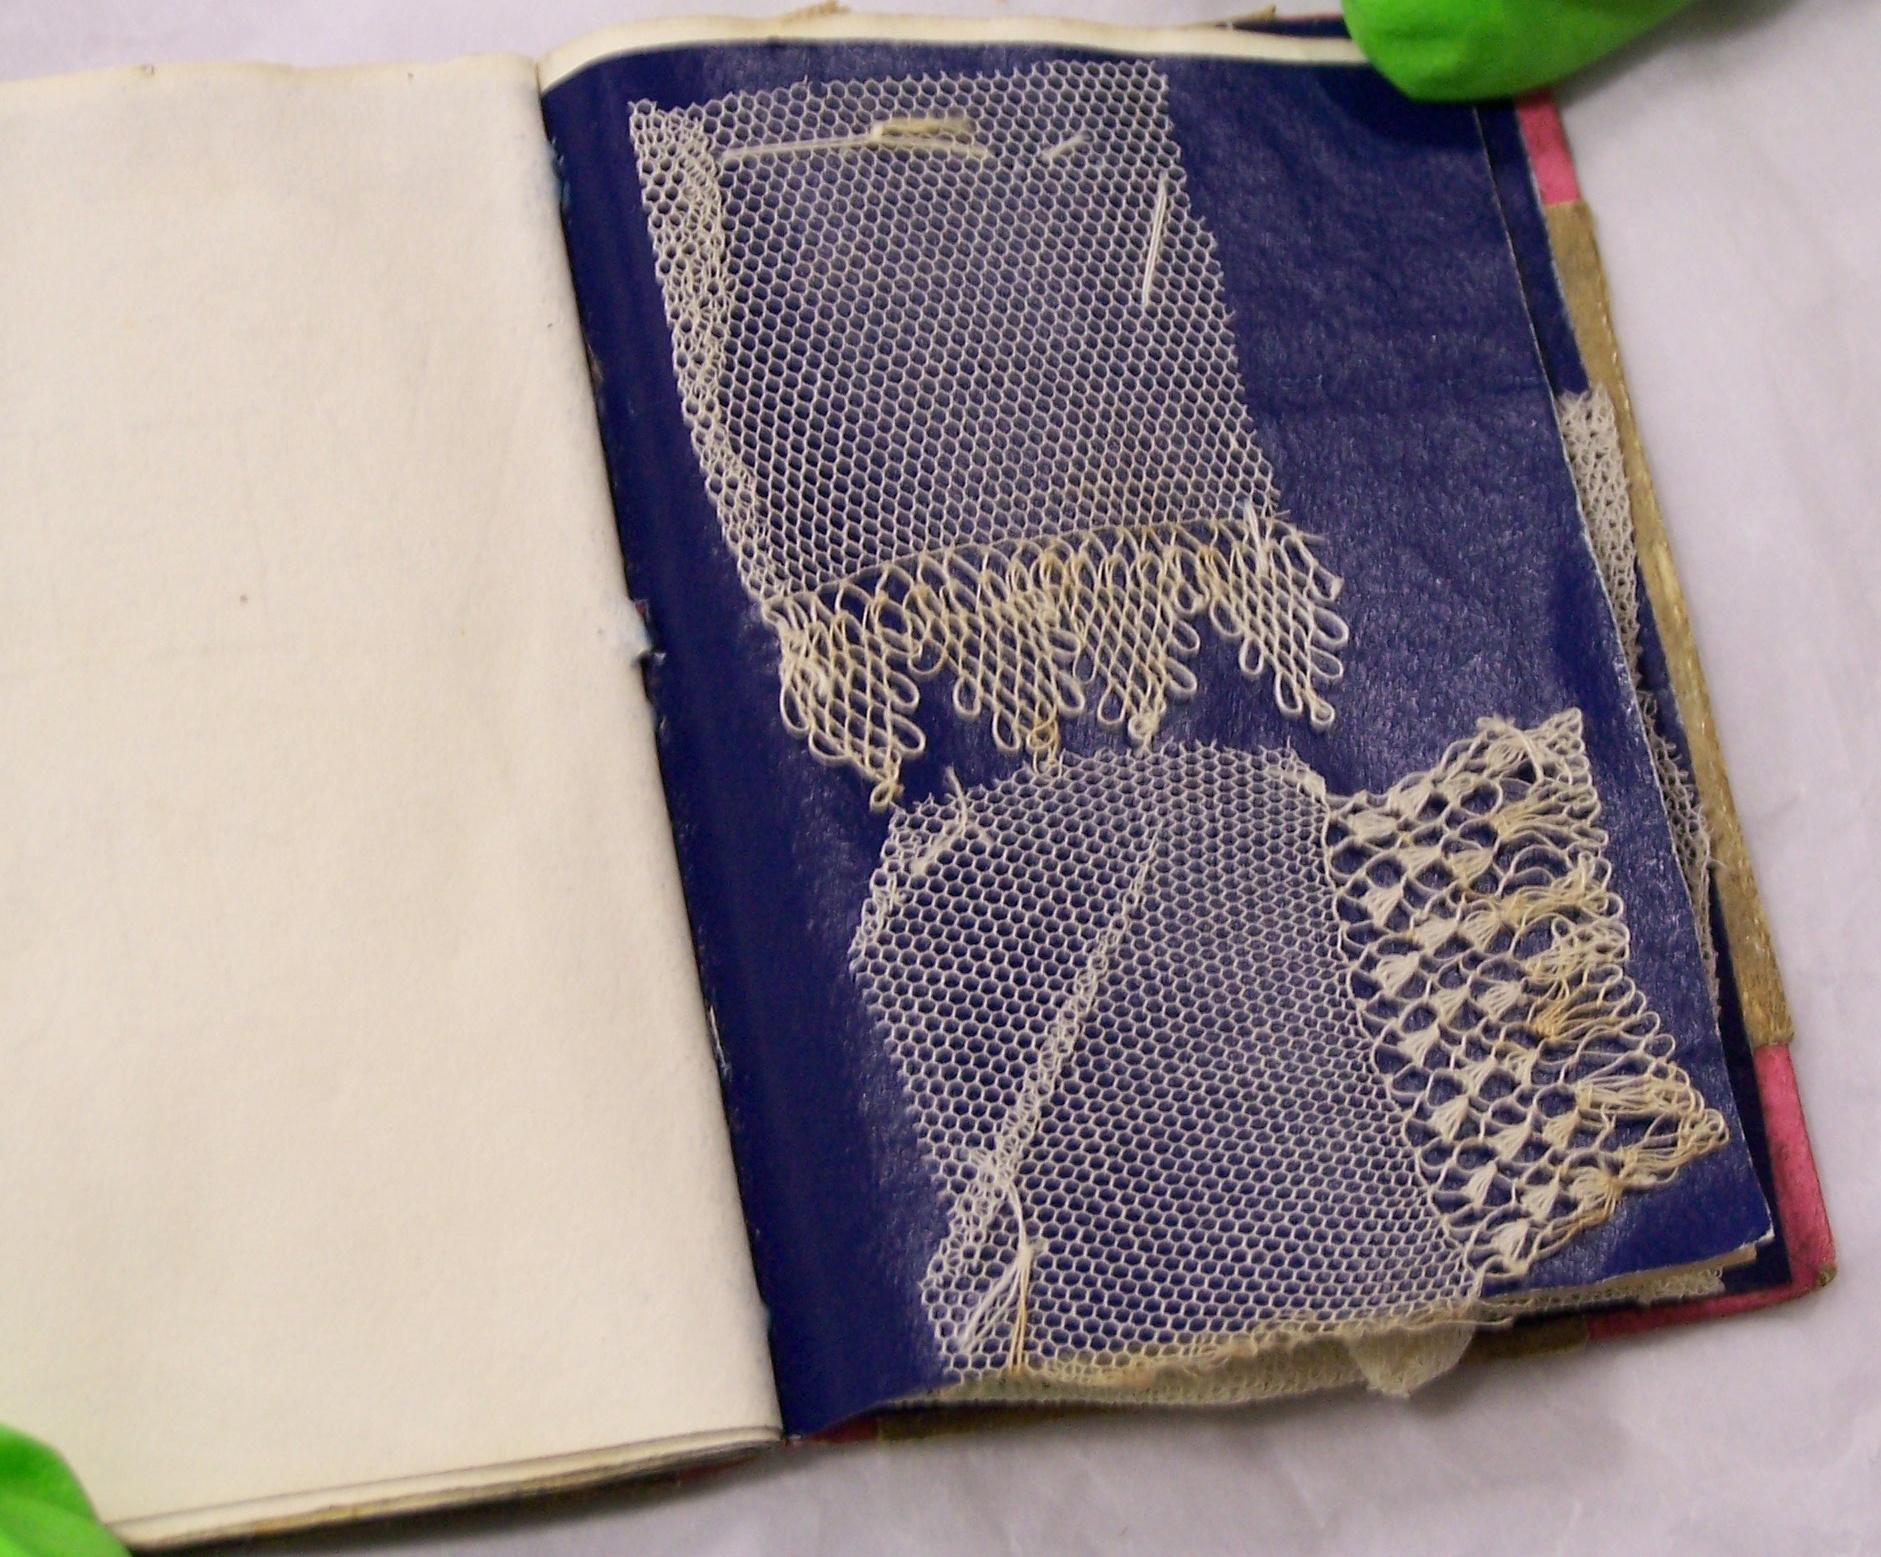 Lace booklet - Fitzwilliam Museum, Cambridge, England Photo: Julie Buck